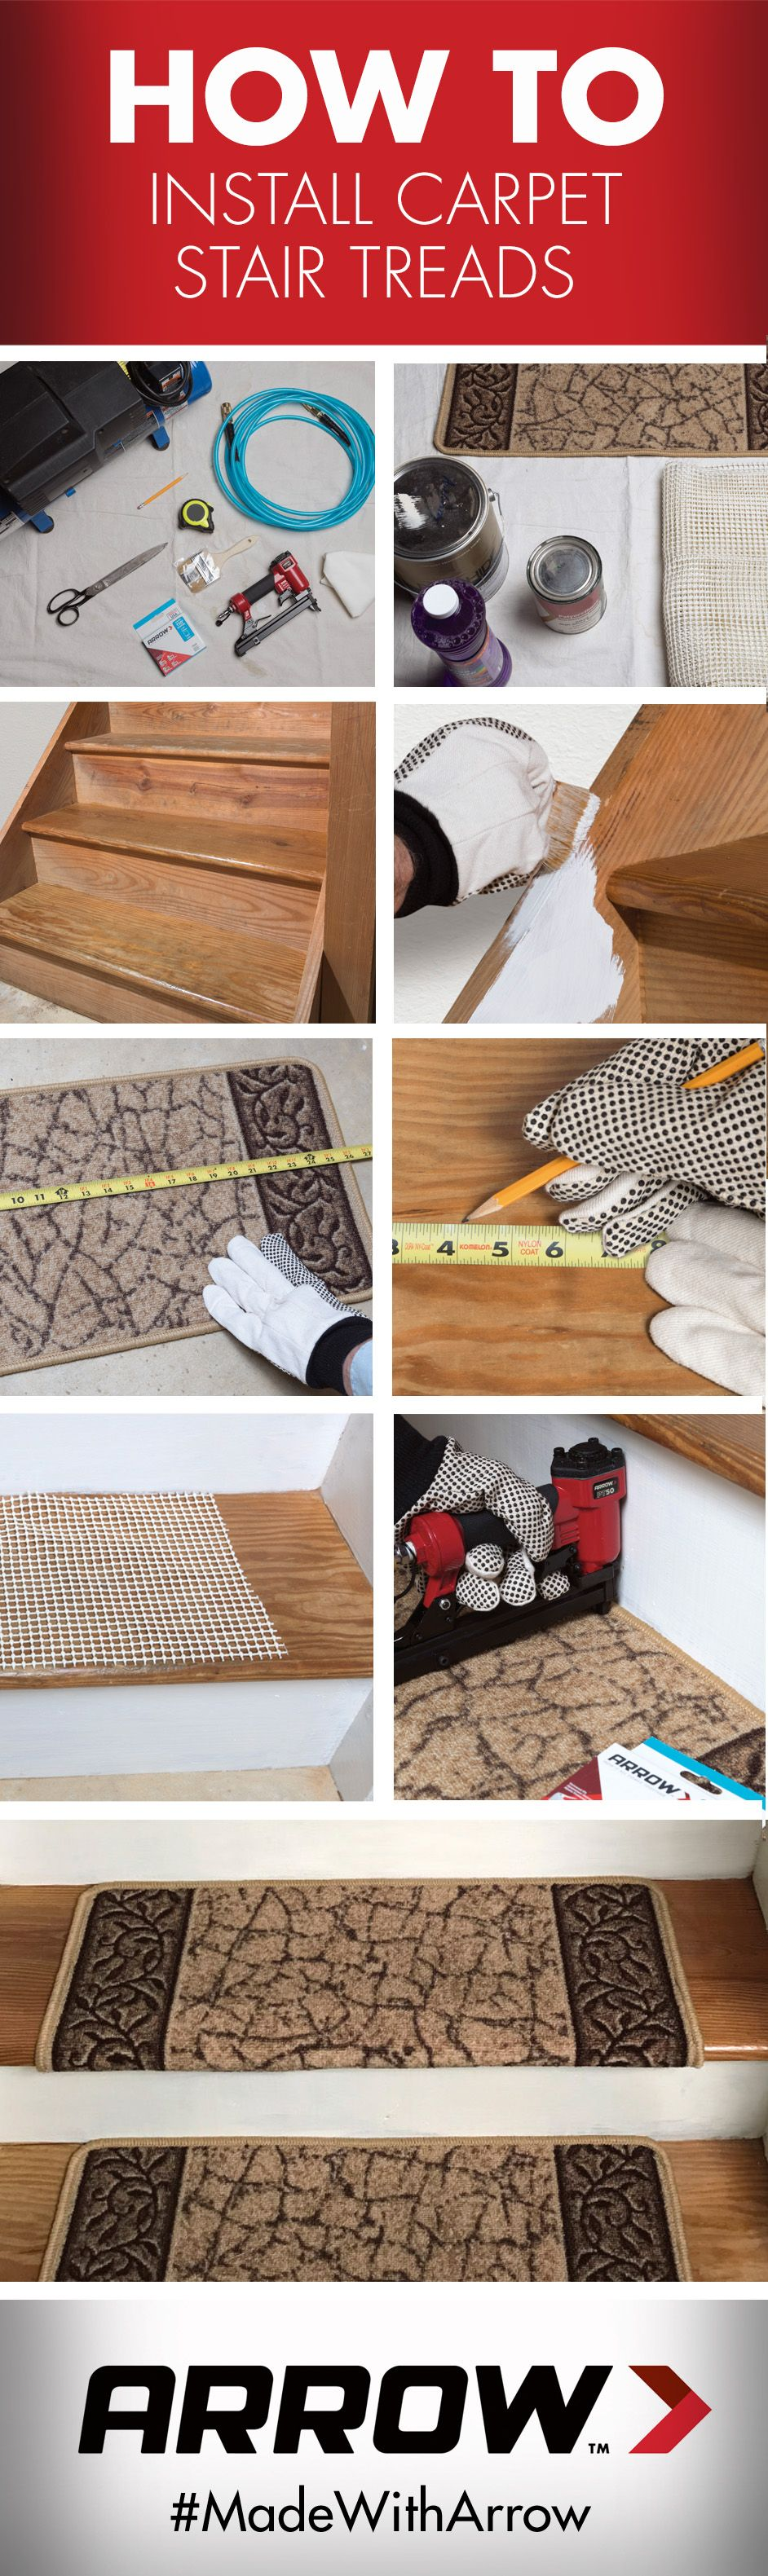 Best Carpet Stair Treads Carpet Stair Treads Carpet 640 x 480